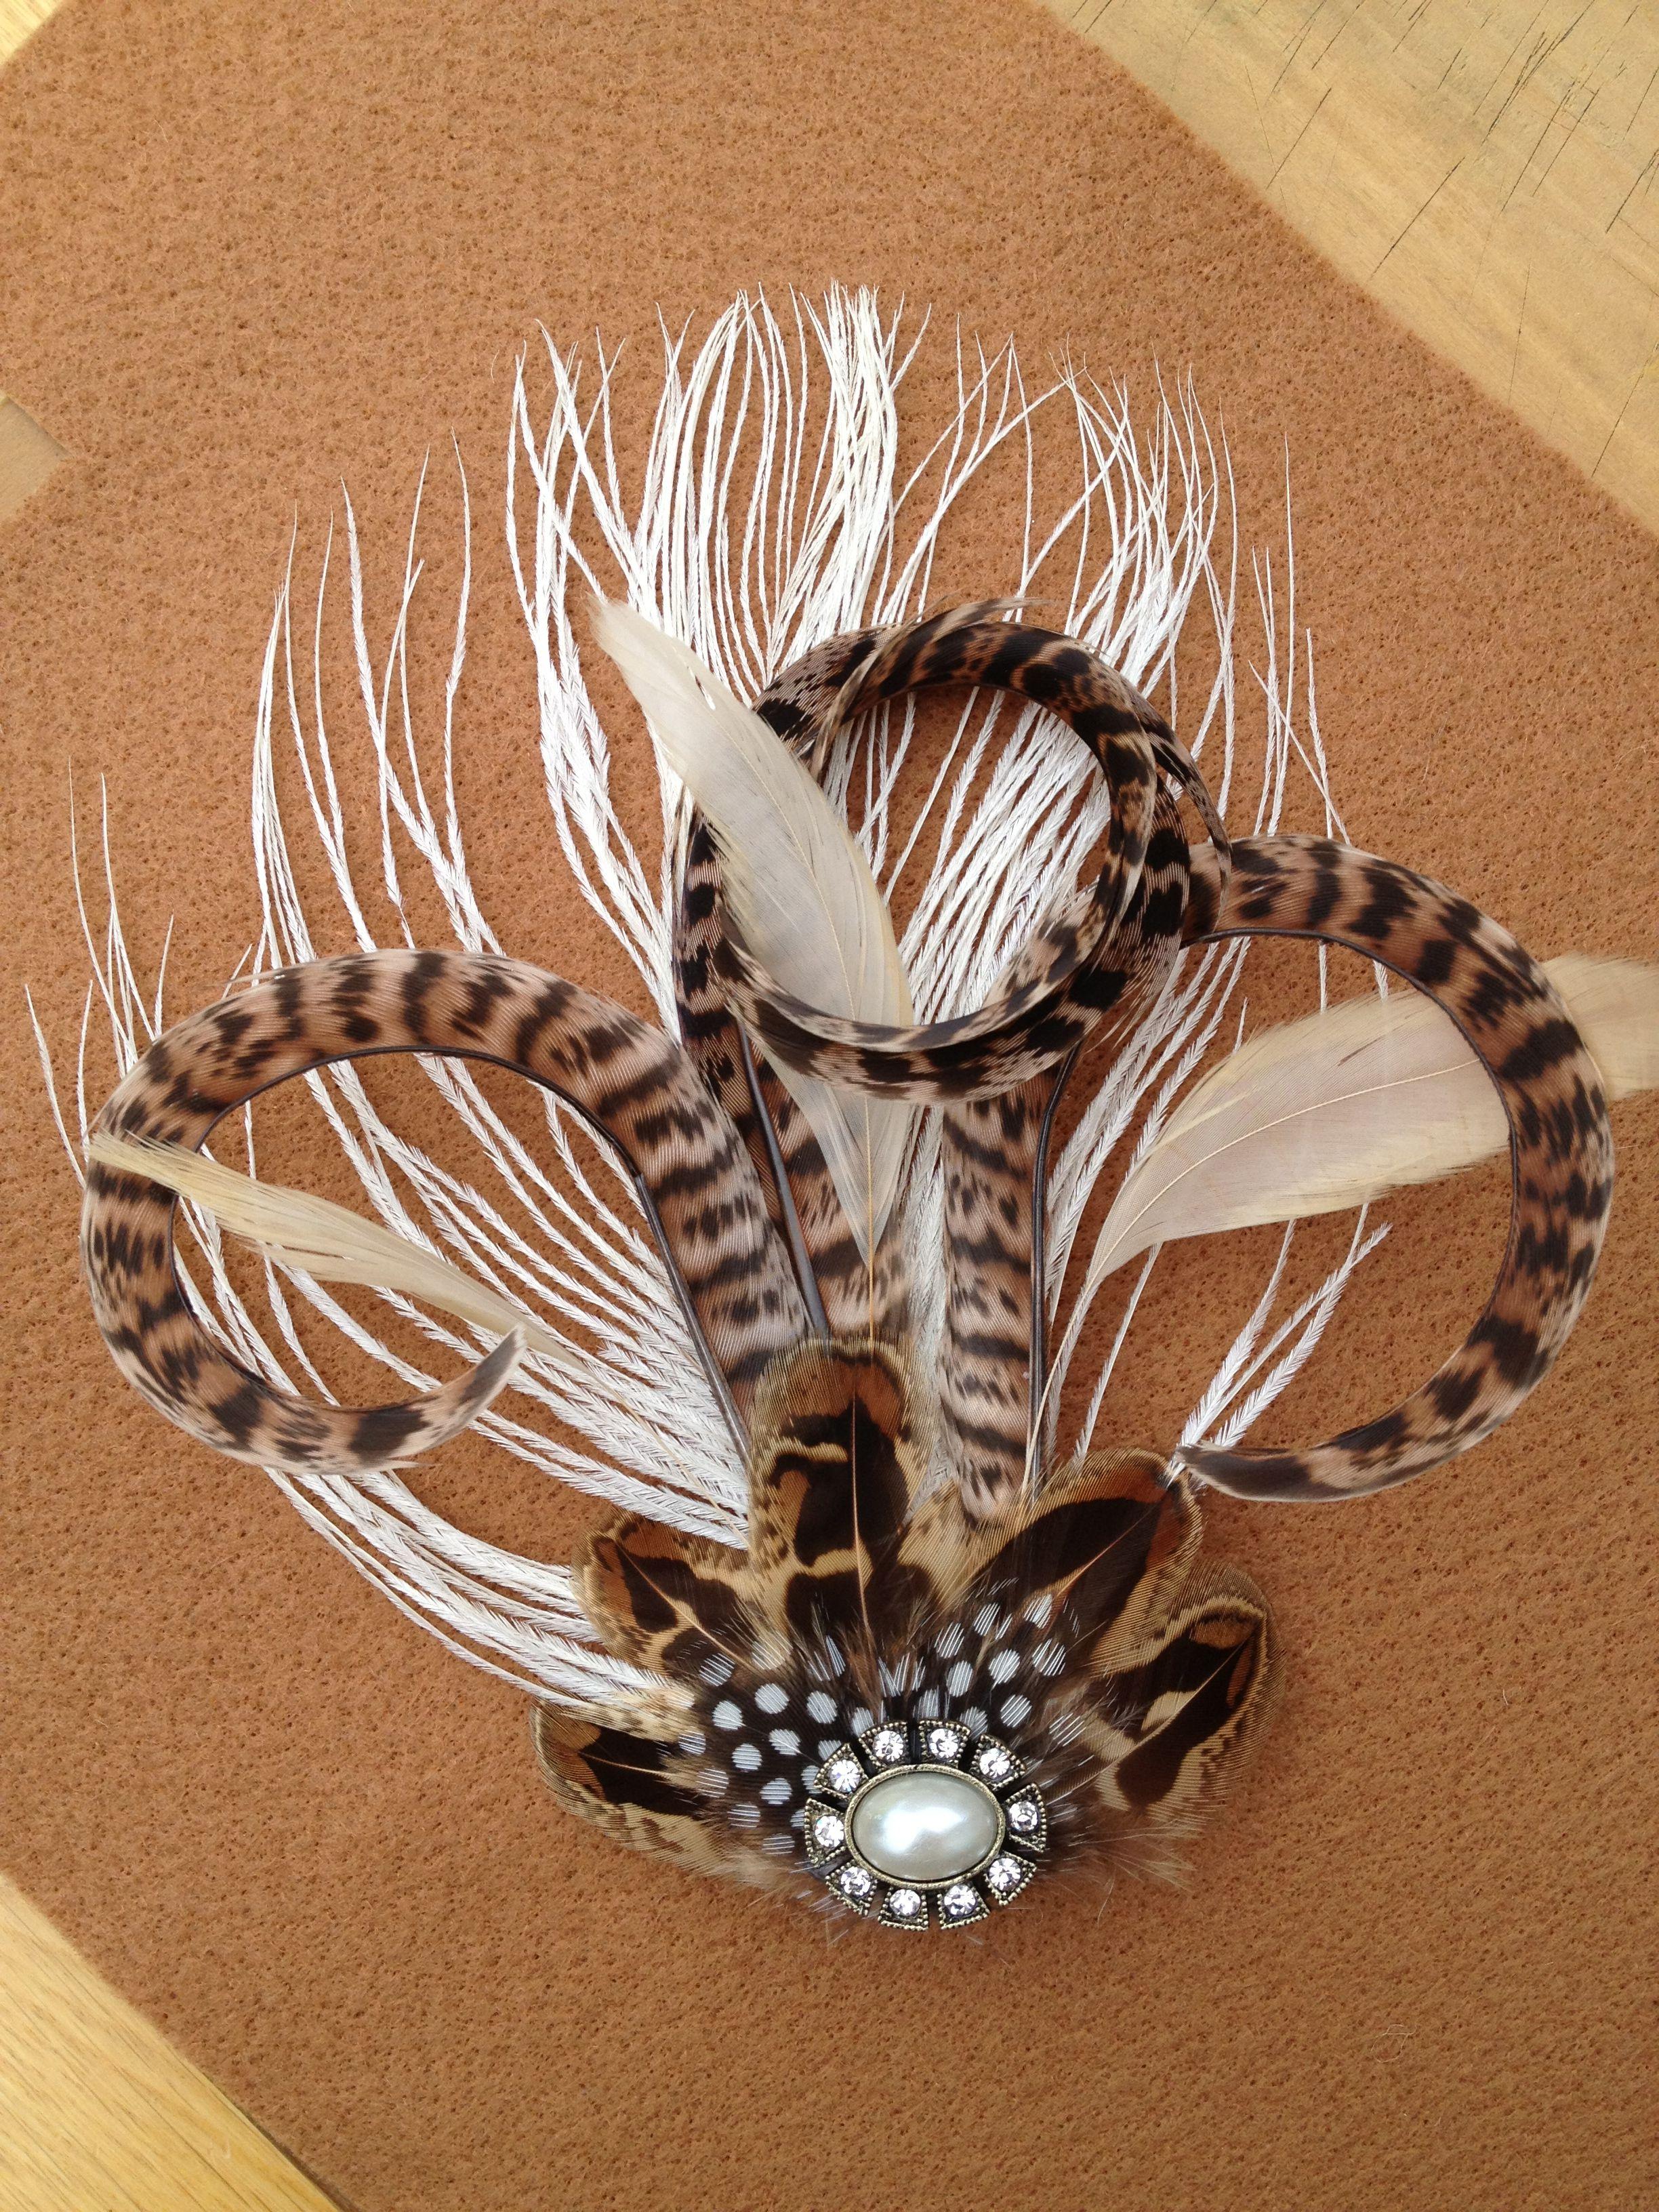 Handmade bridal hair clip, pheasant feather. Feather